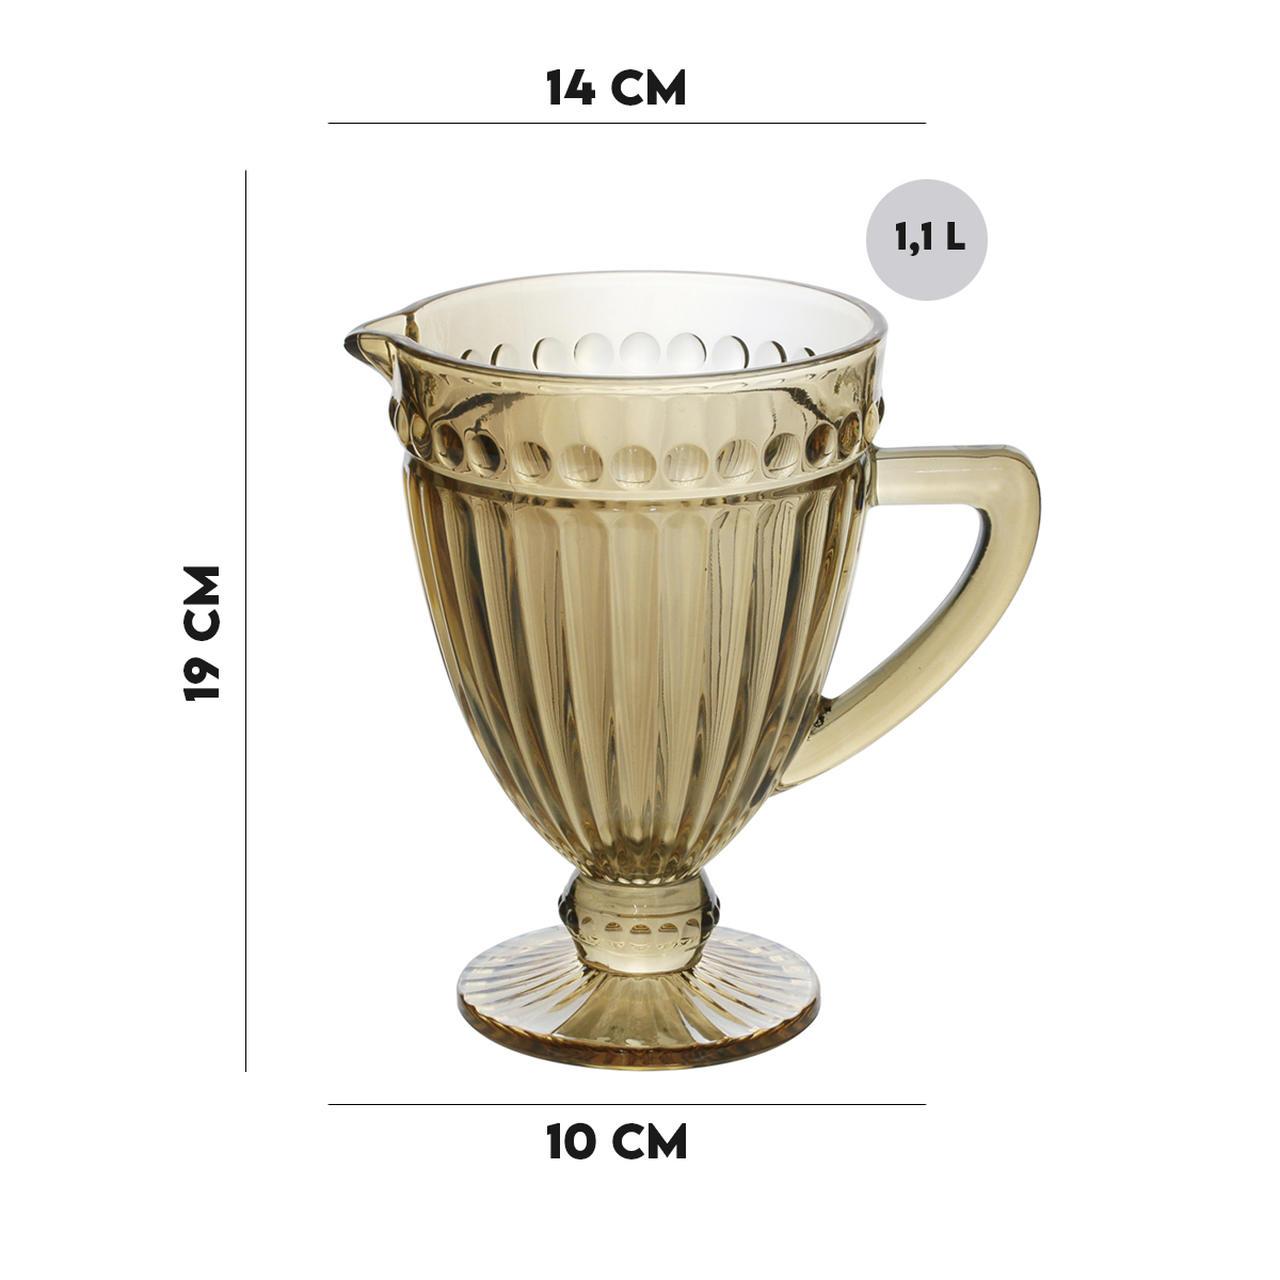 Jarra de Vidro 1,1L Sodo Calcico Empire Ambar Metalizado  - Lemis